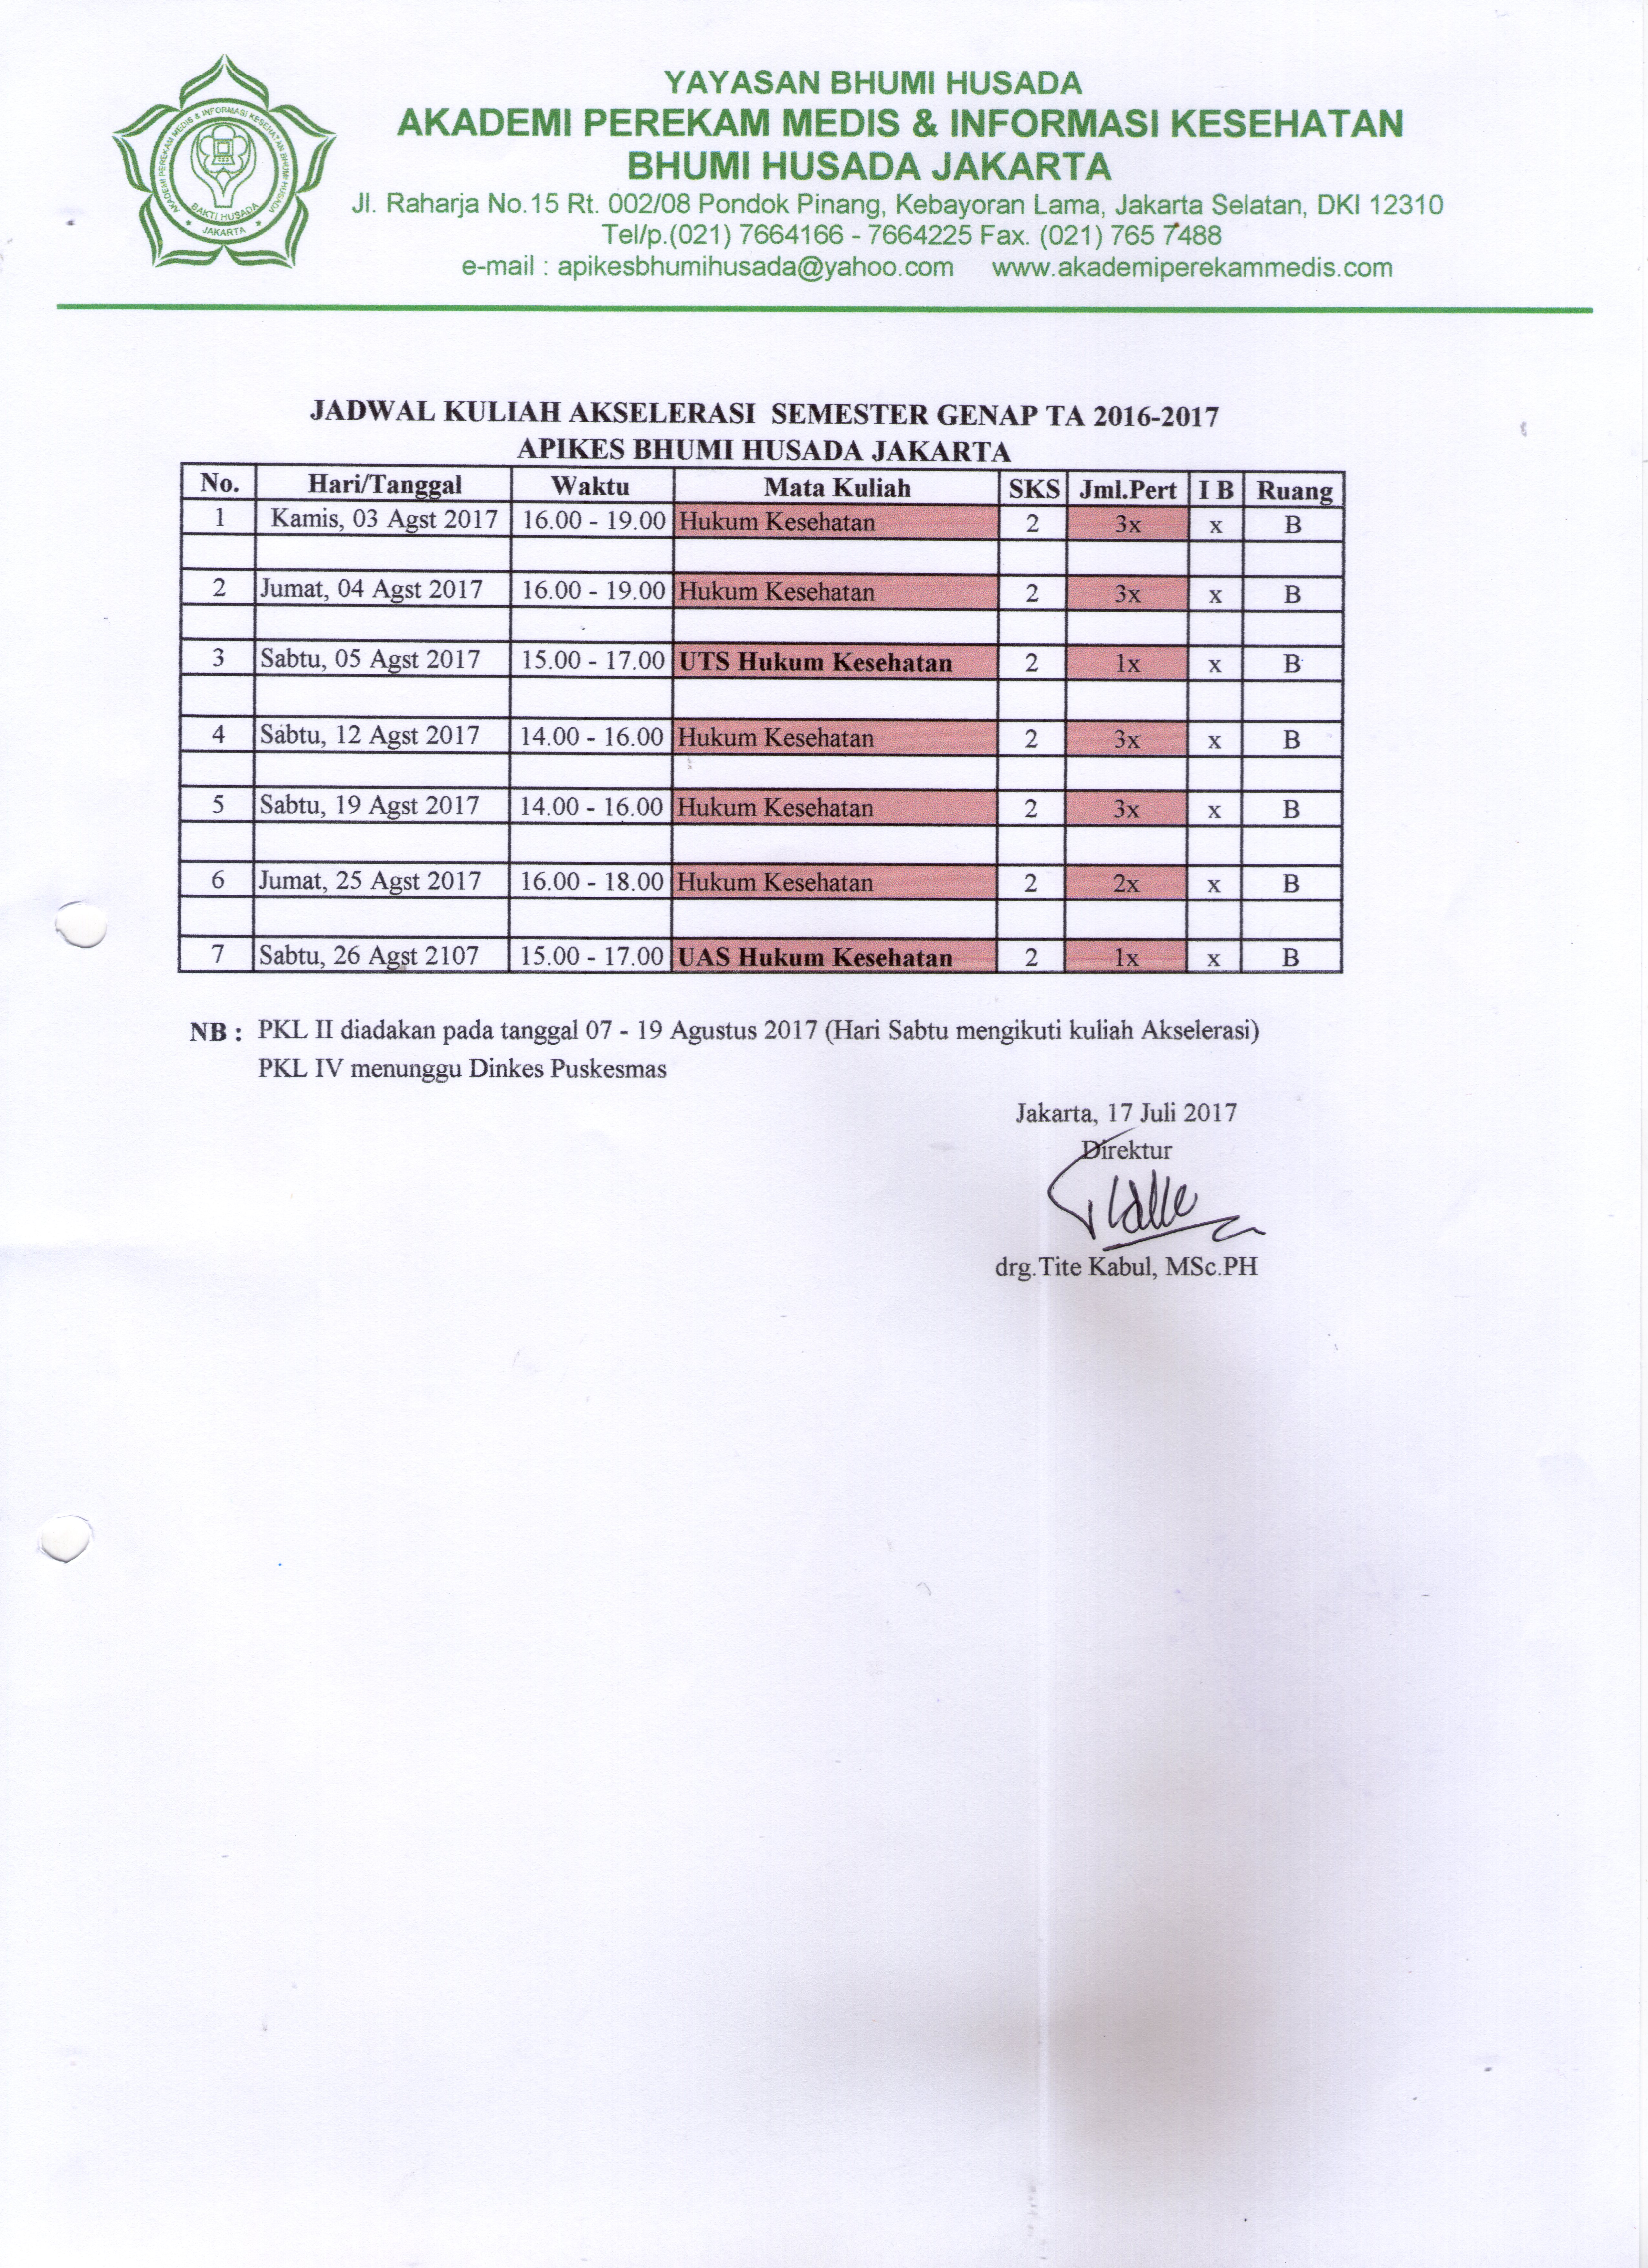 Jadwal Kuliah Akselerasi TA 2016-2017